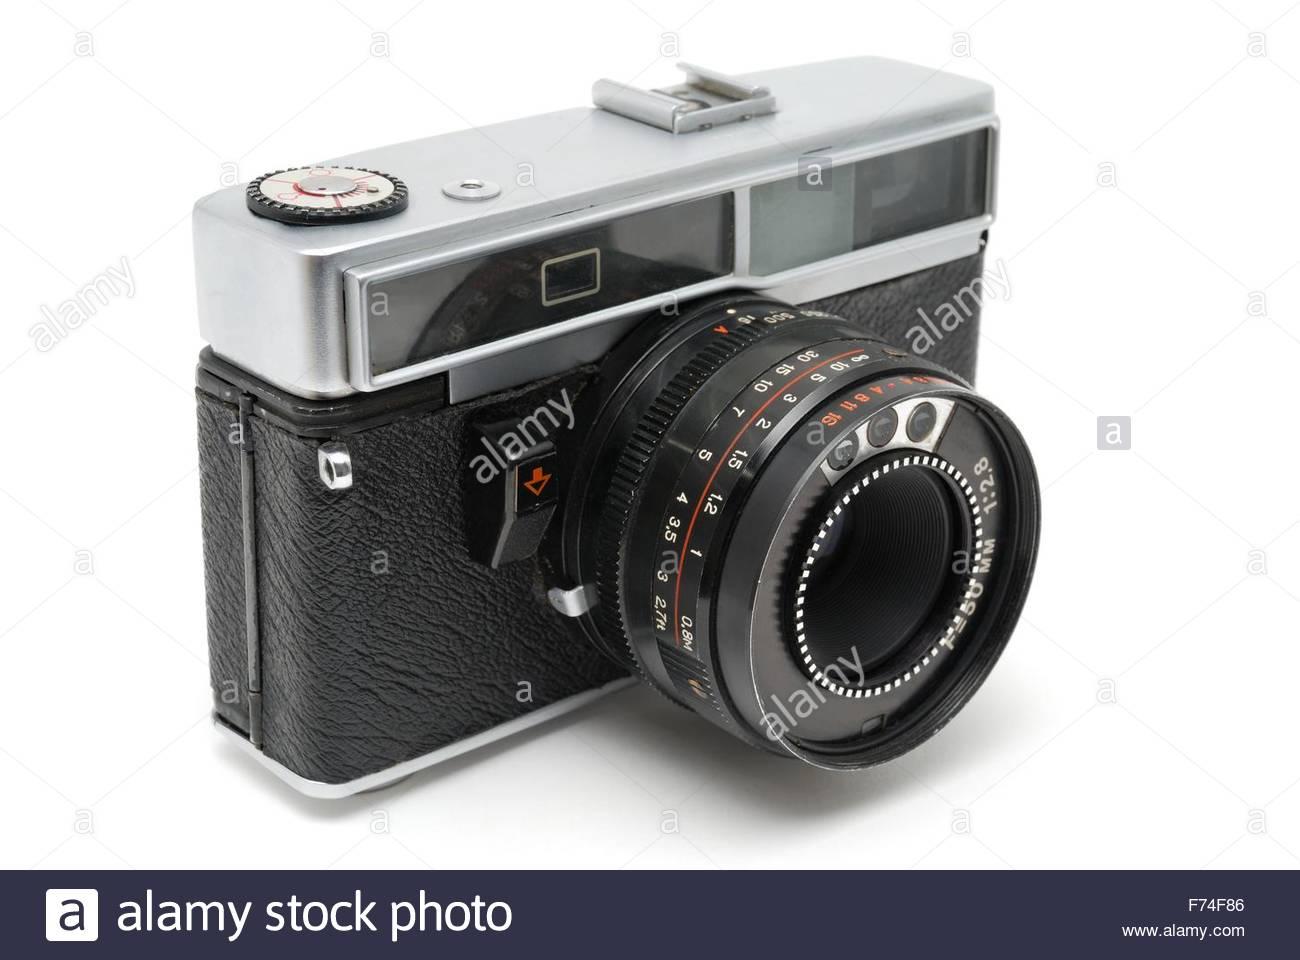 Old Soviet photo camera - Stock Image